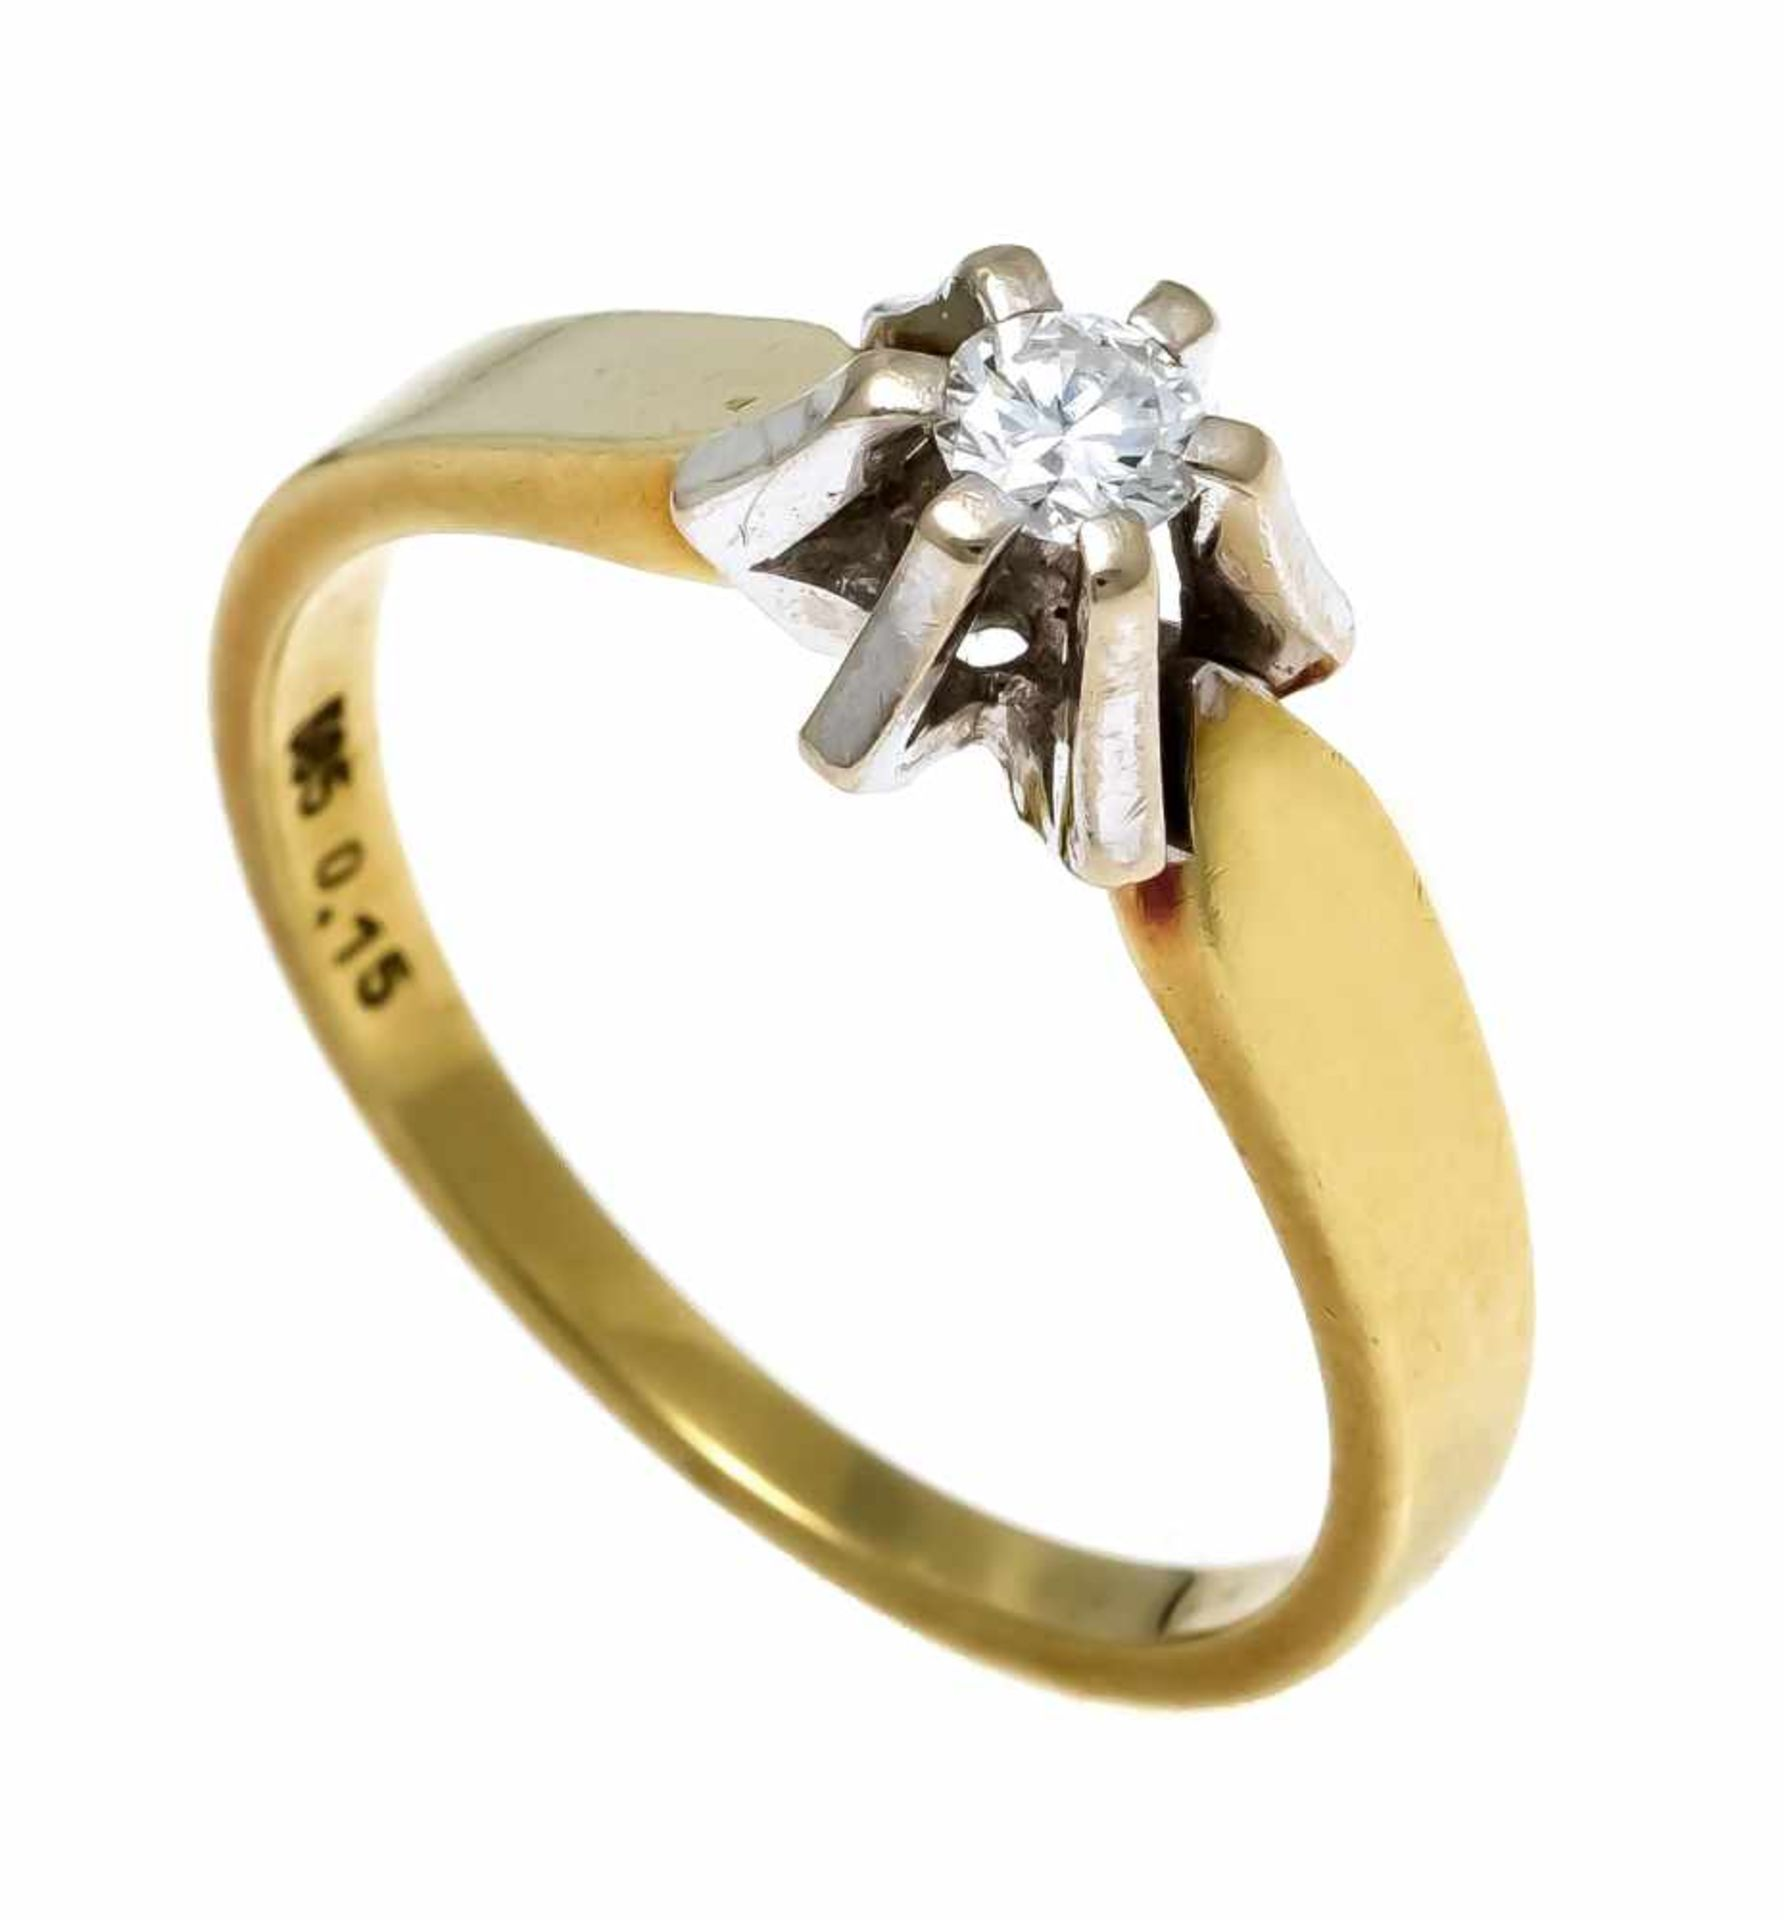 Brillant-Ring GG/WG 585/000 mit einem Brillanten 0,15 ct W/VVS-VS, RG 54, 3,5 gDiamond ring GG /